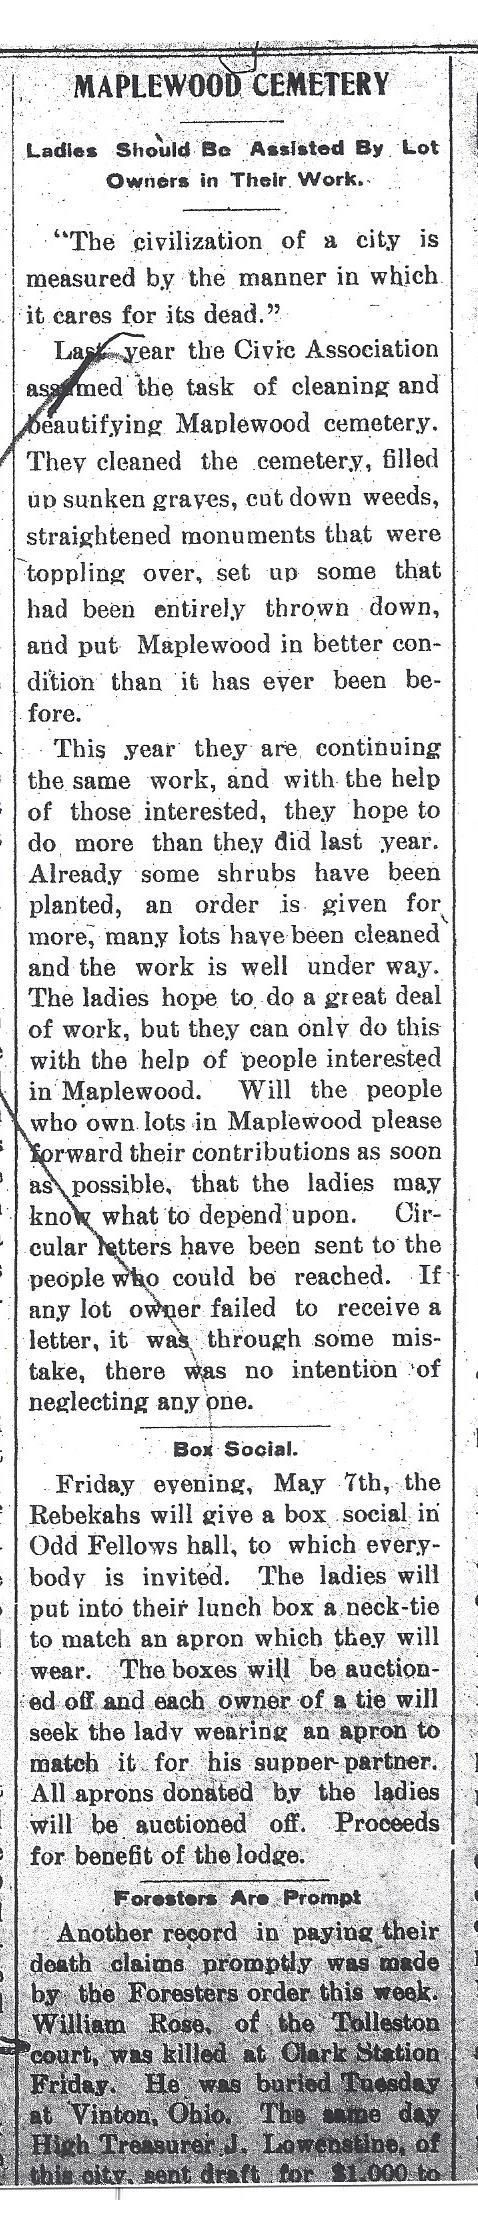 Evening Messenger May 5, 1900